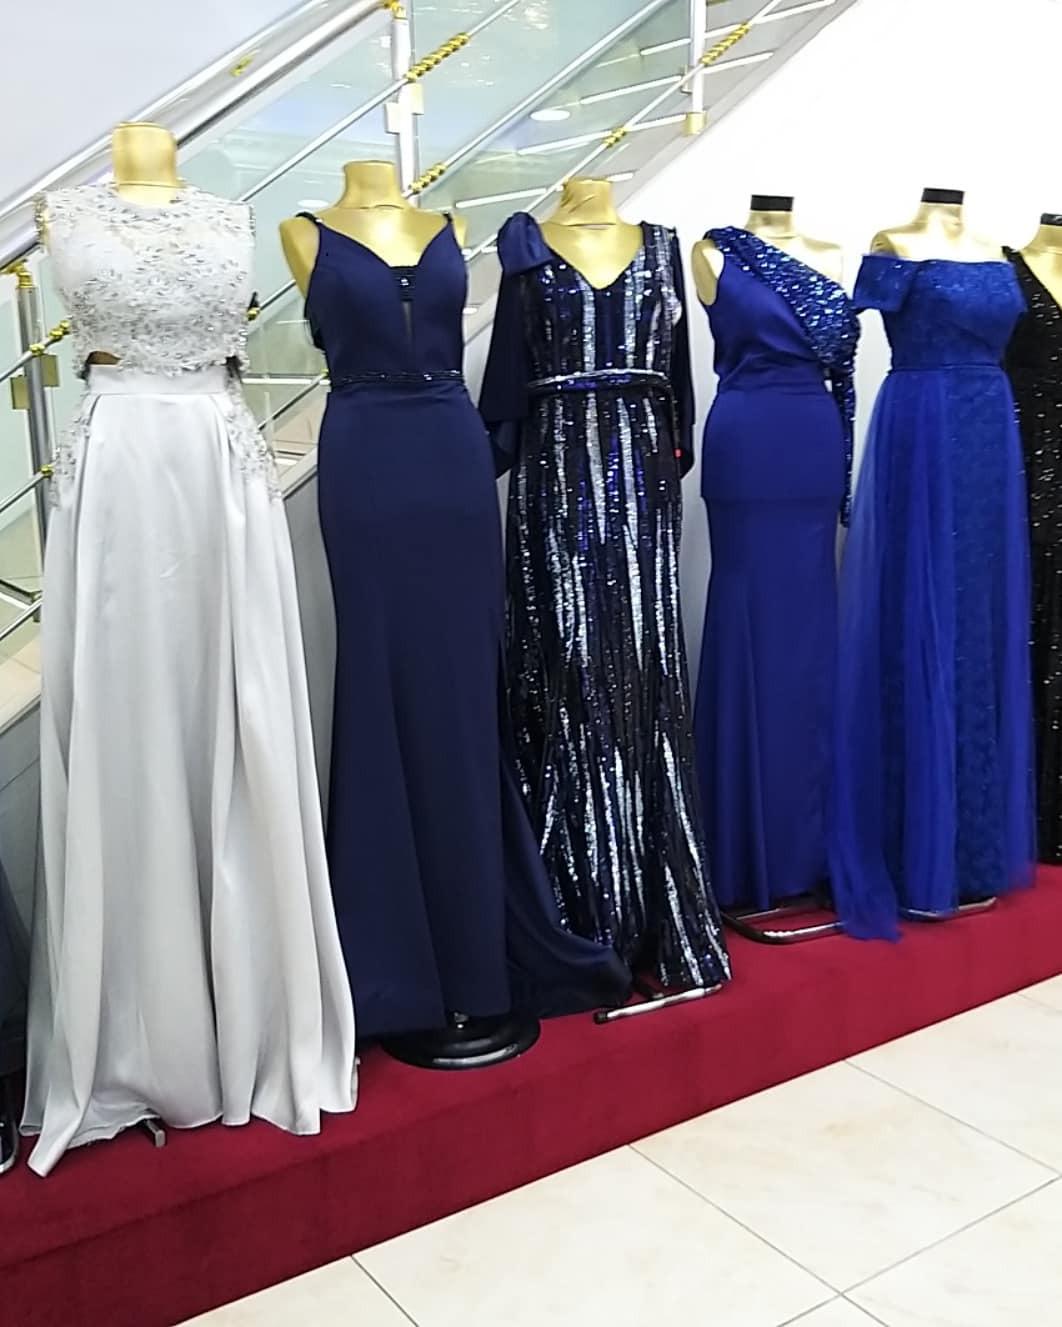 Abend Top Alle Abendkleider DesignDesigner Elegant Alle Abendkleider Boutique